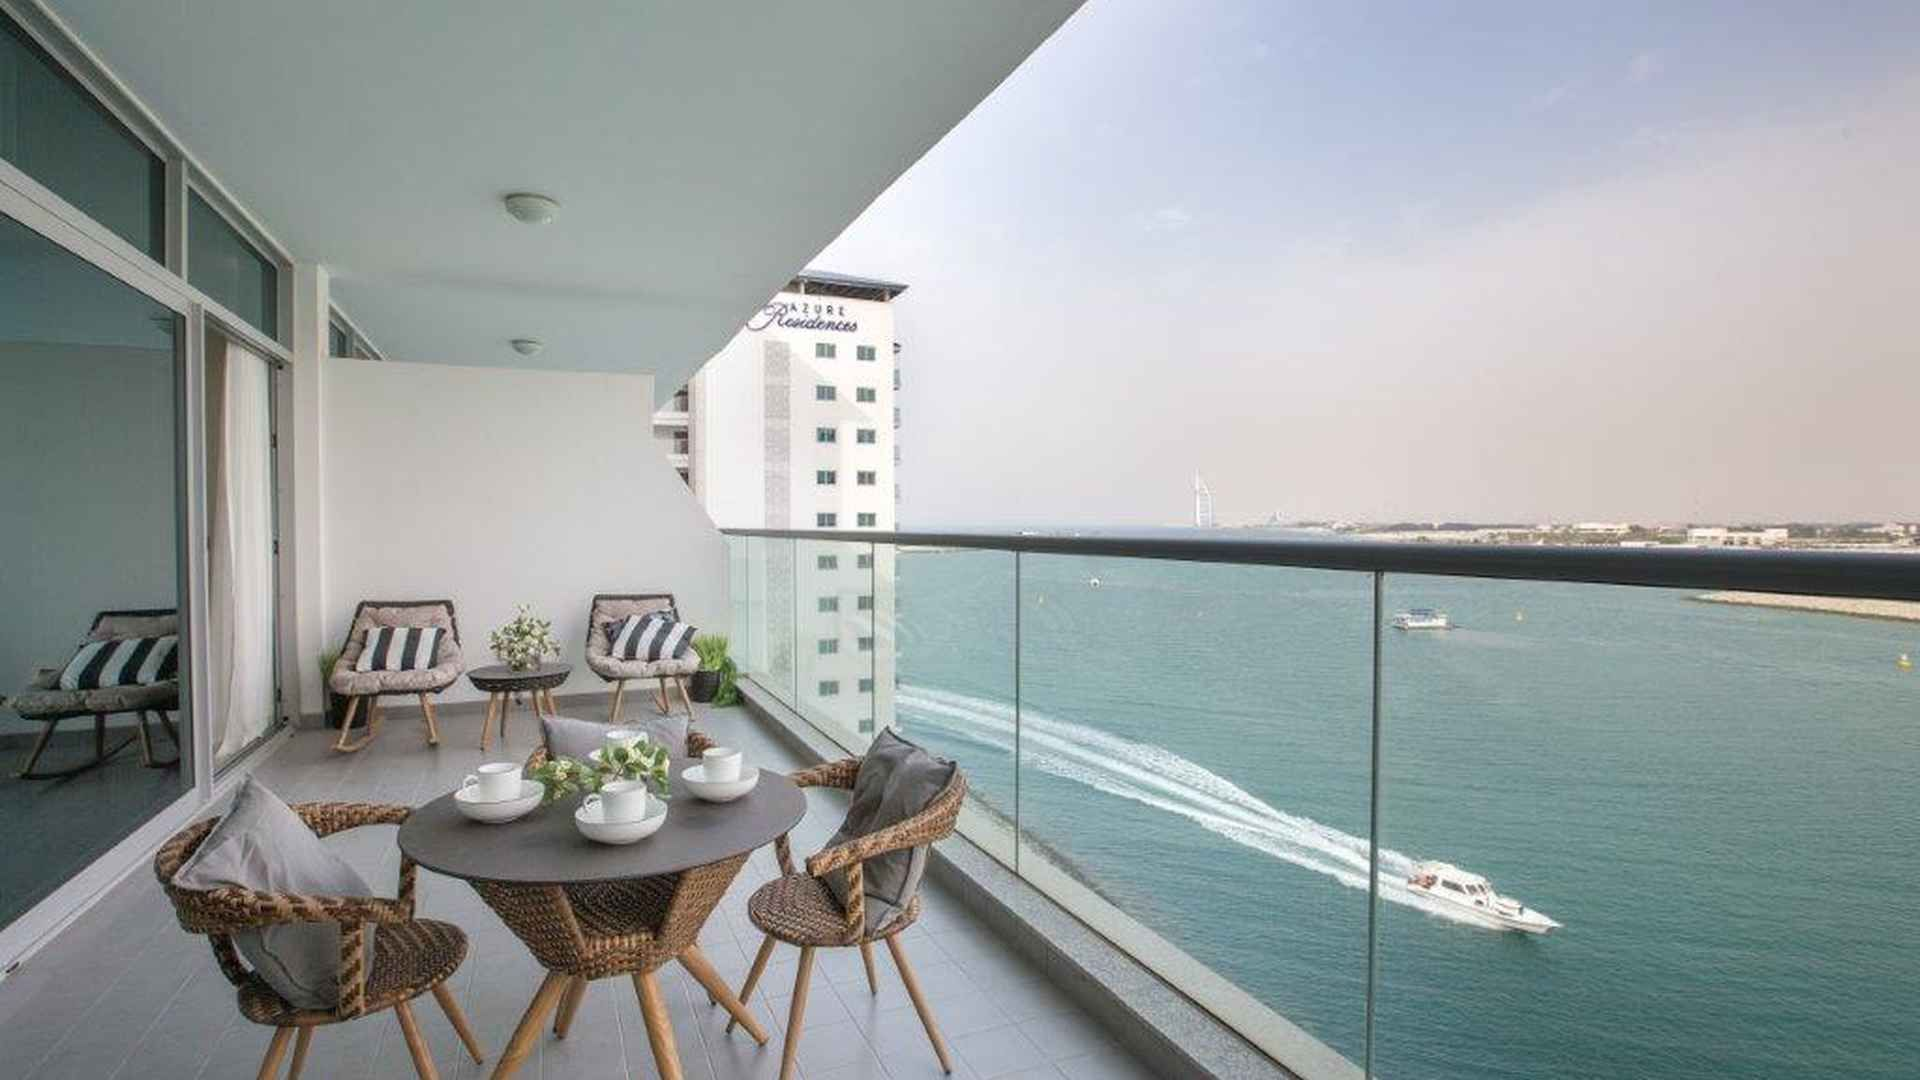 Azure Residences Apartments For Sale In Dubai Apartments For Sale Waterside Living Floor To Ceiling Windows